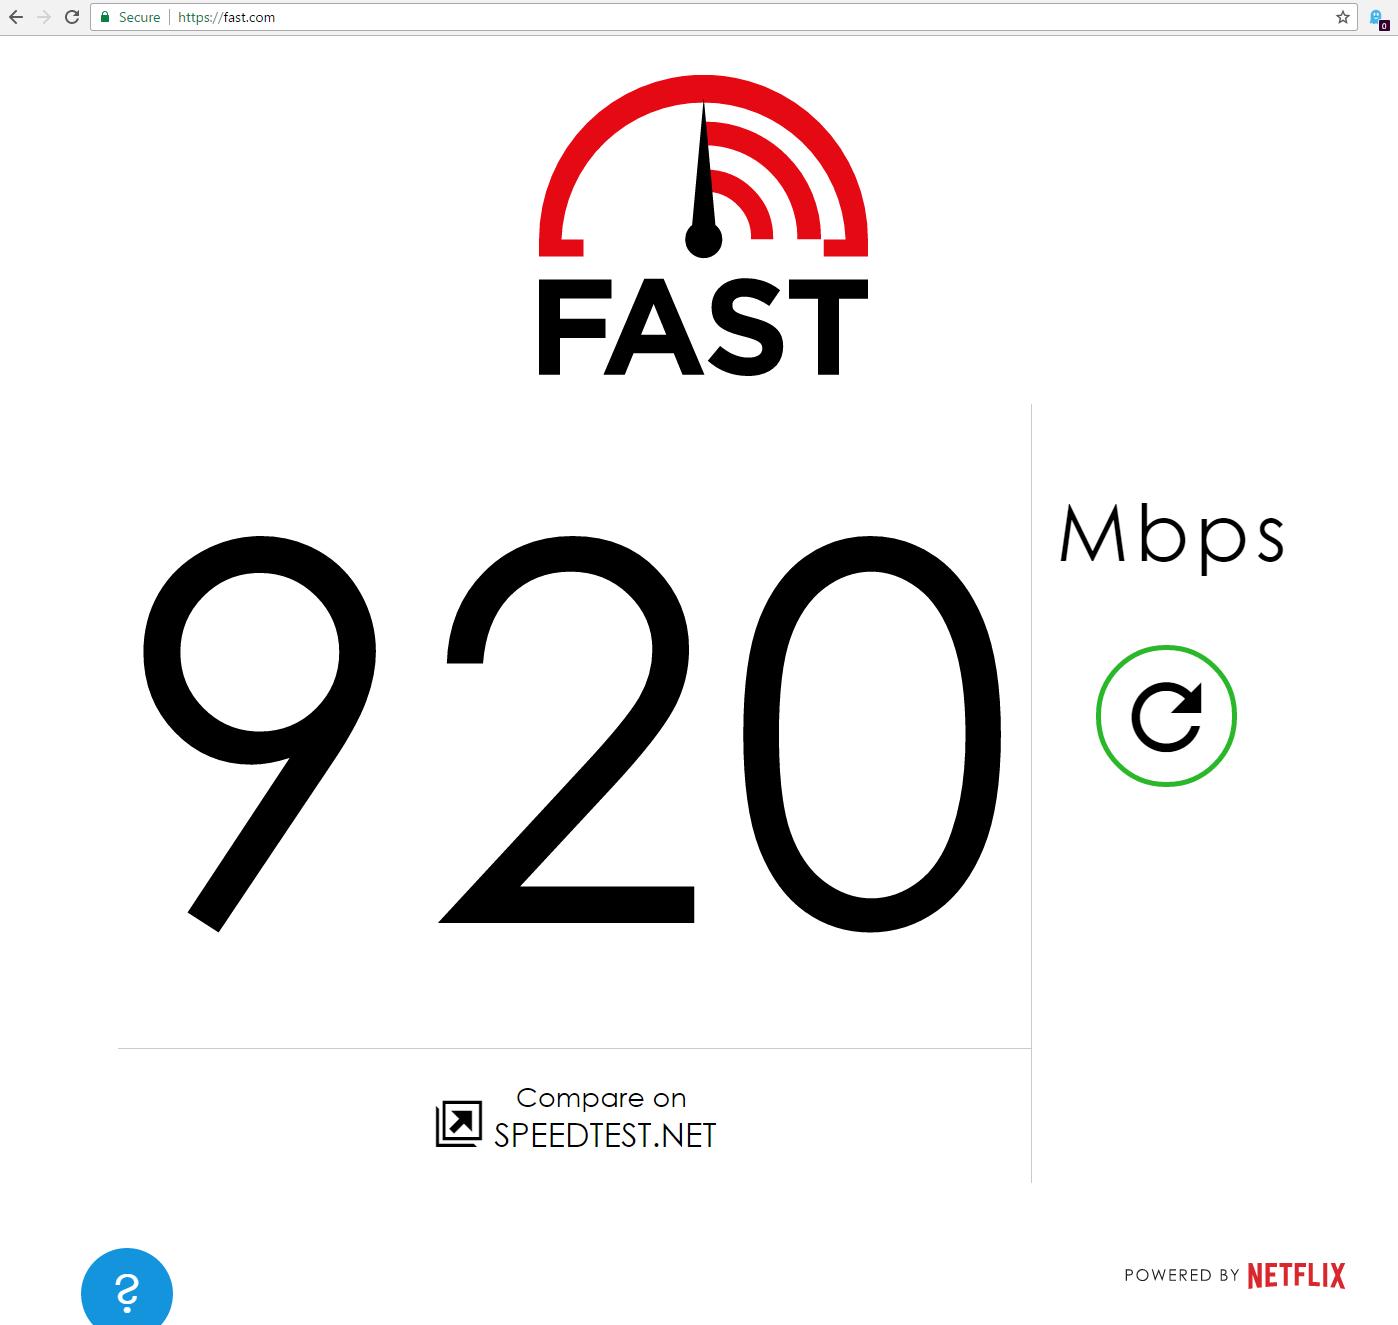 My Home Network Ubiquiti Unifi Gear Fiber Gigabit